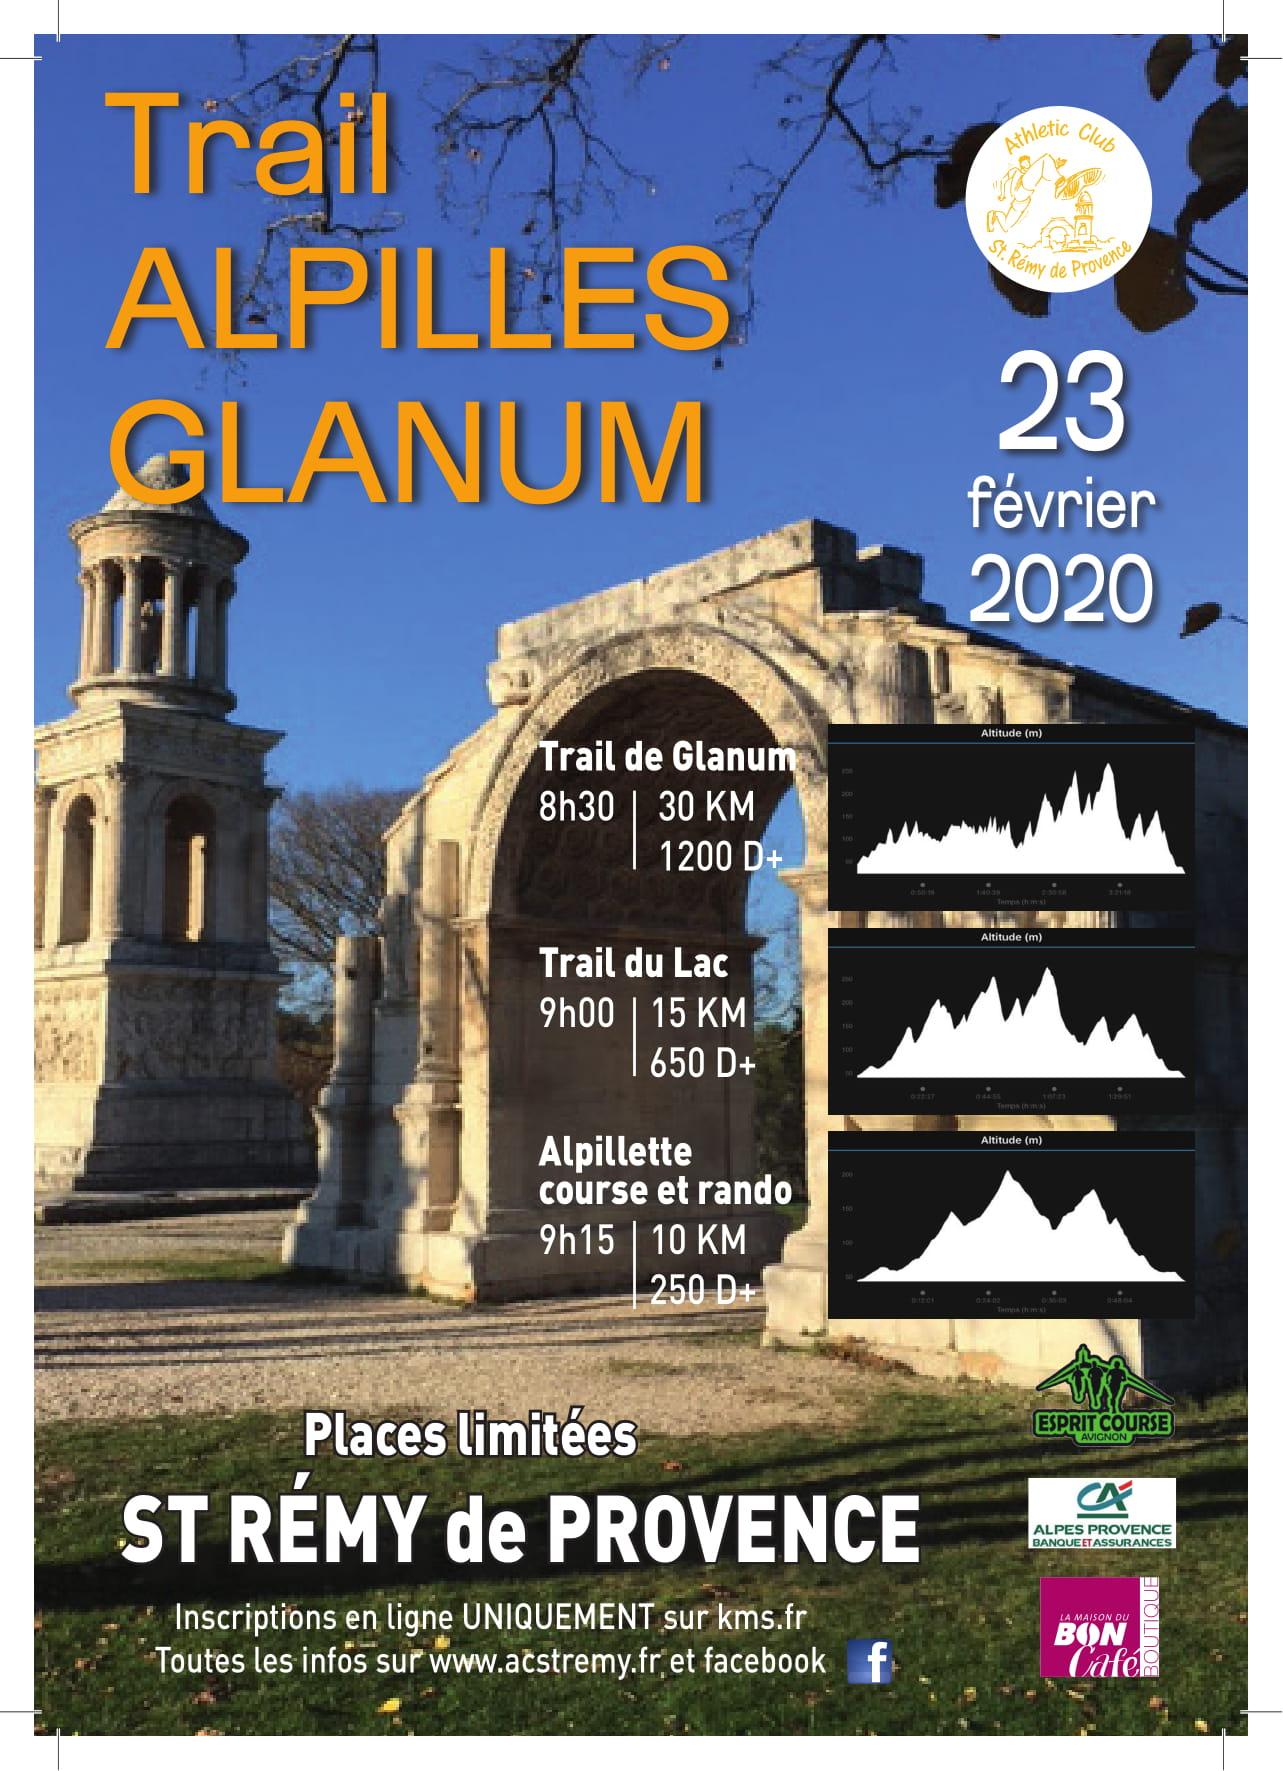 TRAIL DE GLANUM 30 KM